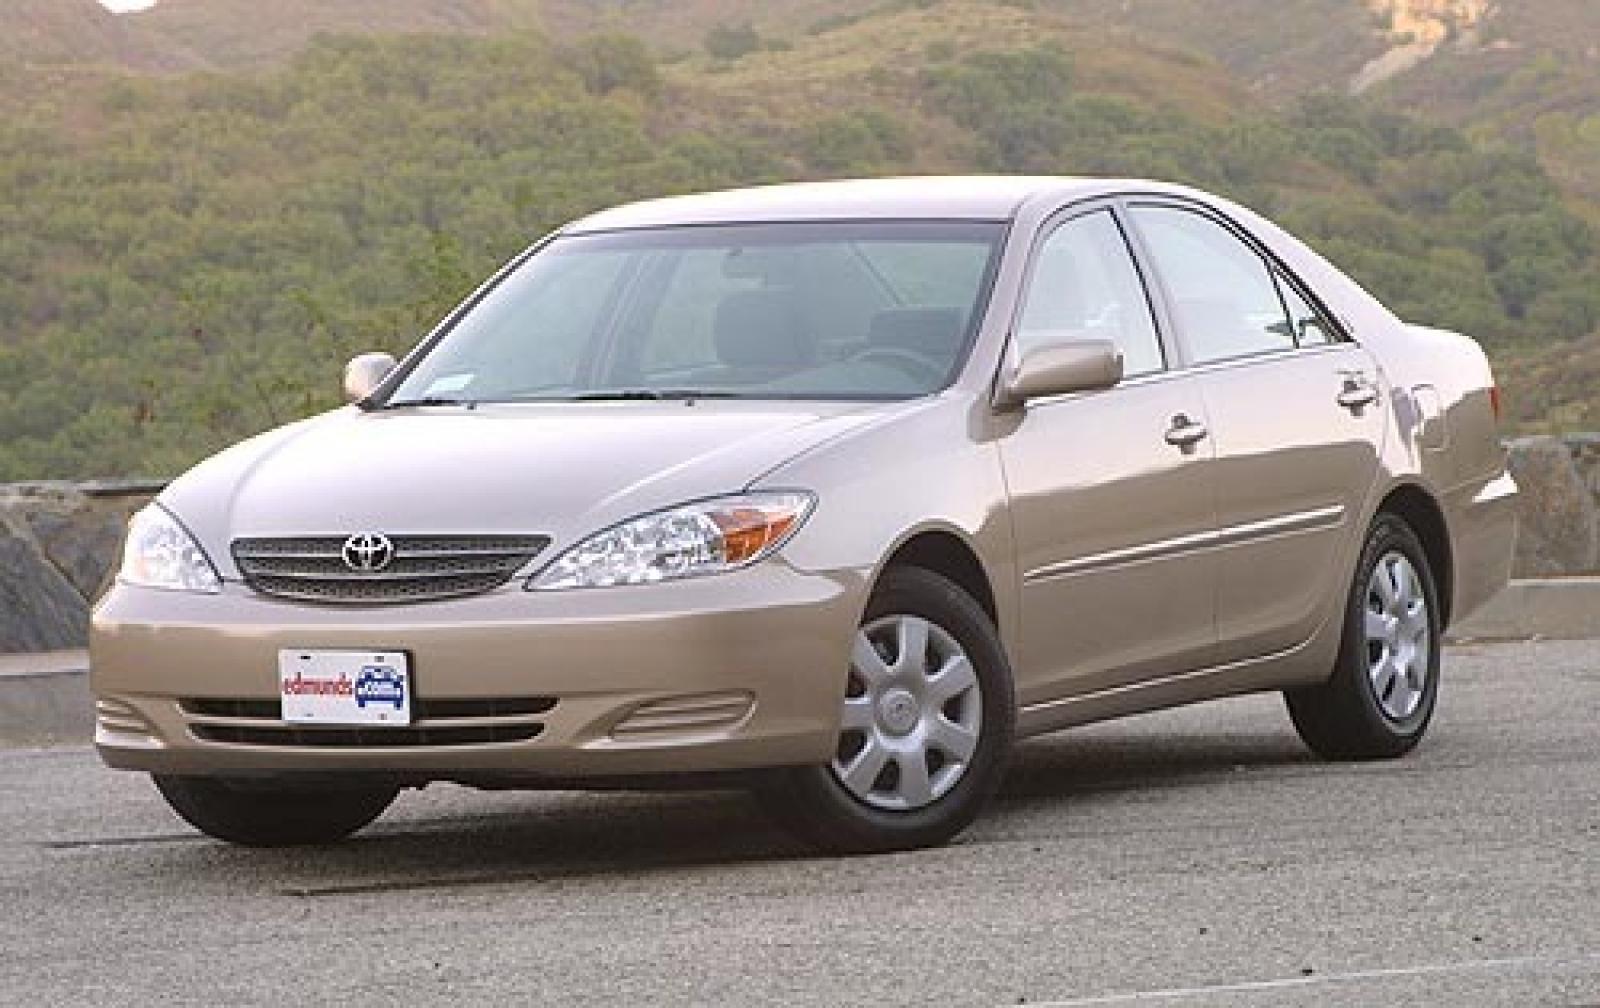 2004 Toyota Camry #1 800 1024 1280 1600 Origin